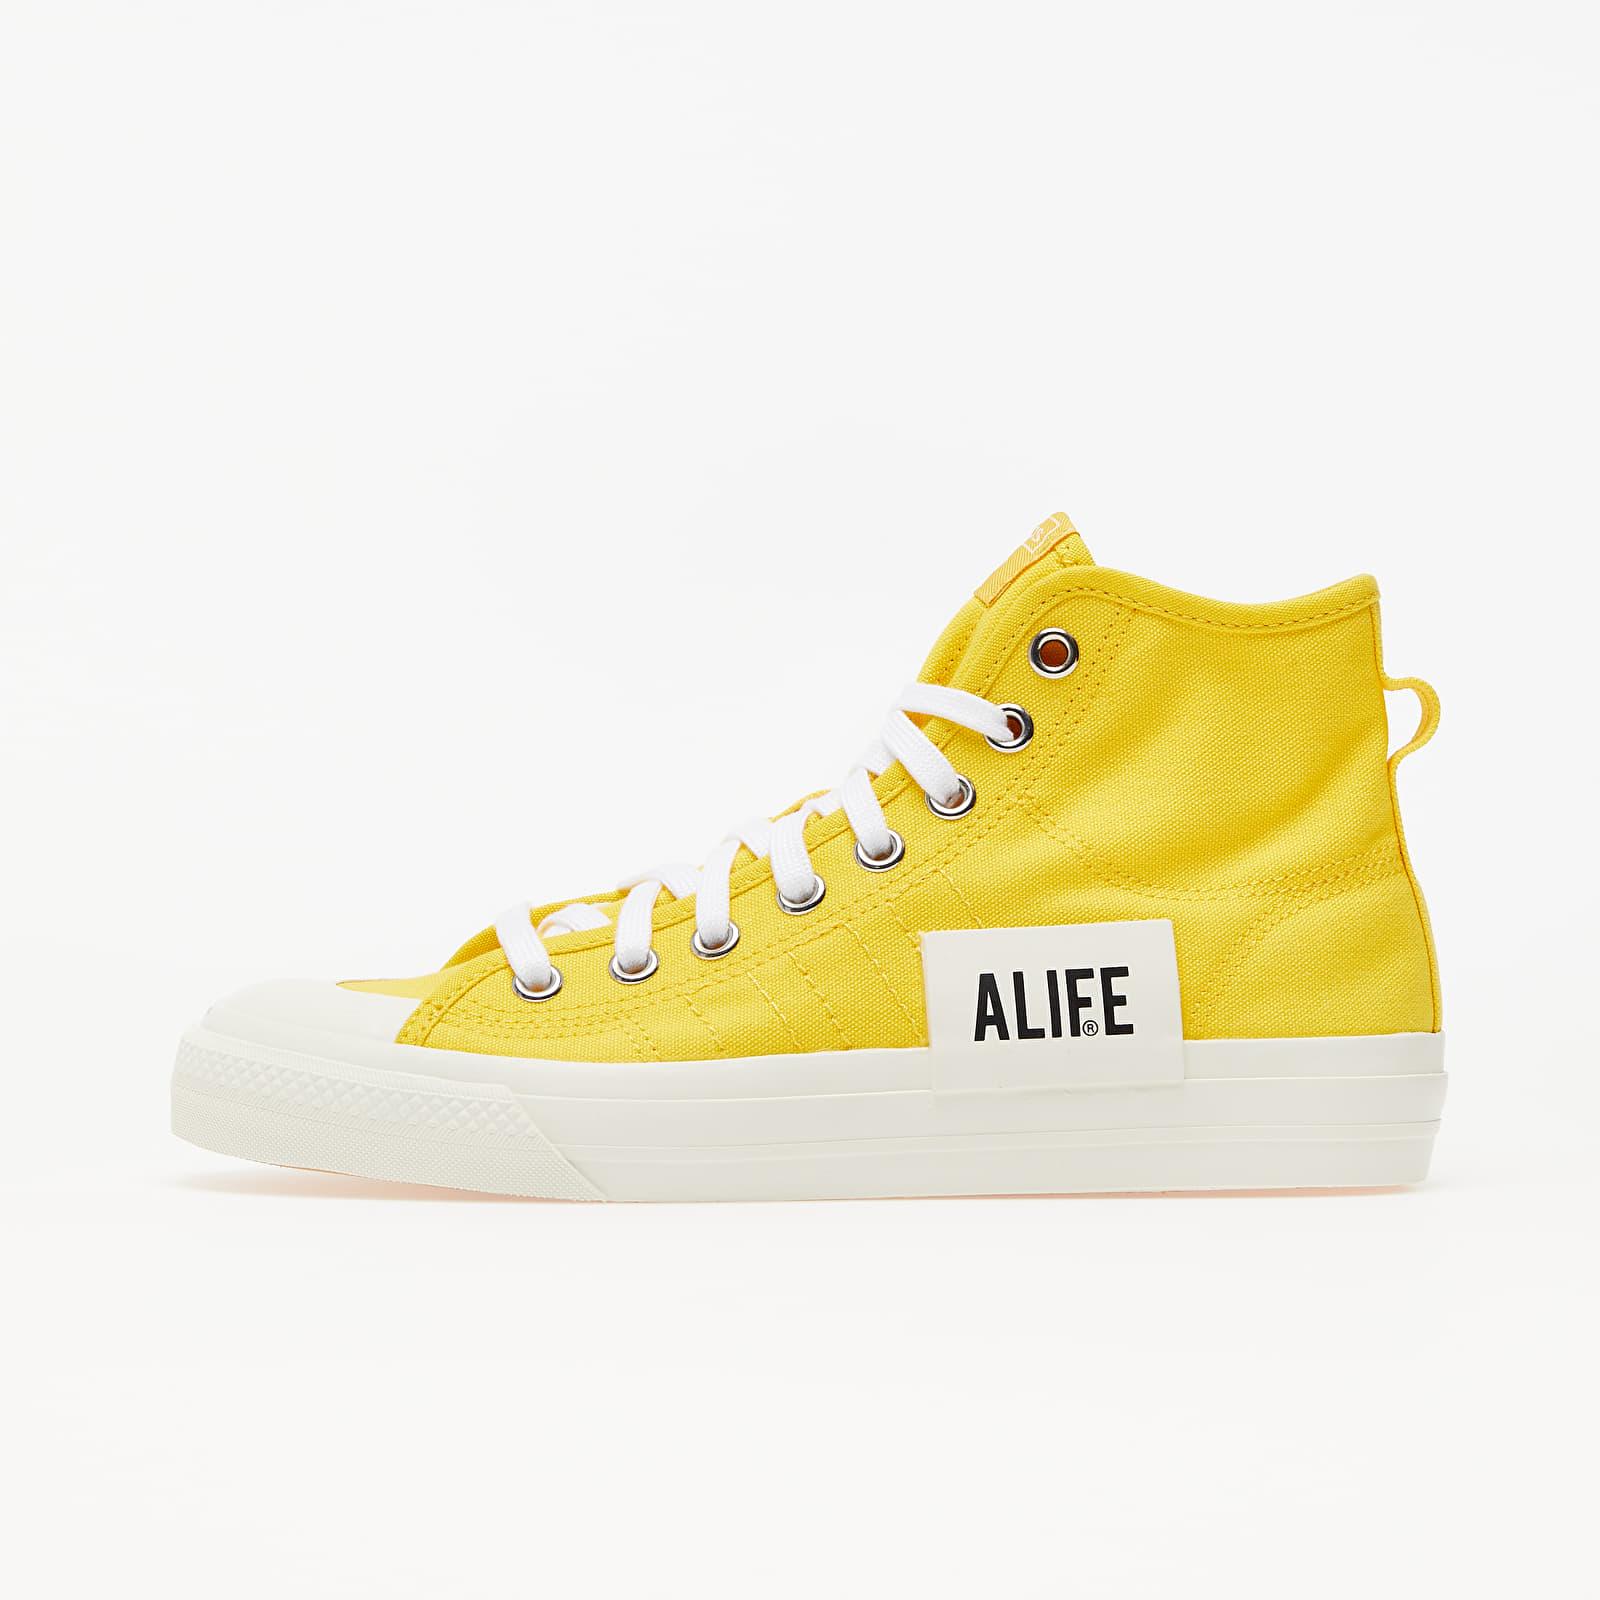 Men's shoes adidas x ALIFE Nizza Hi Wonder Glow/ Off White/ Off White